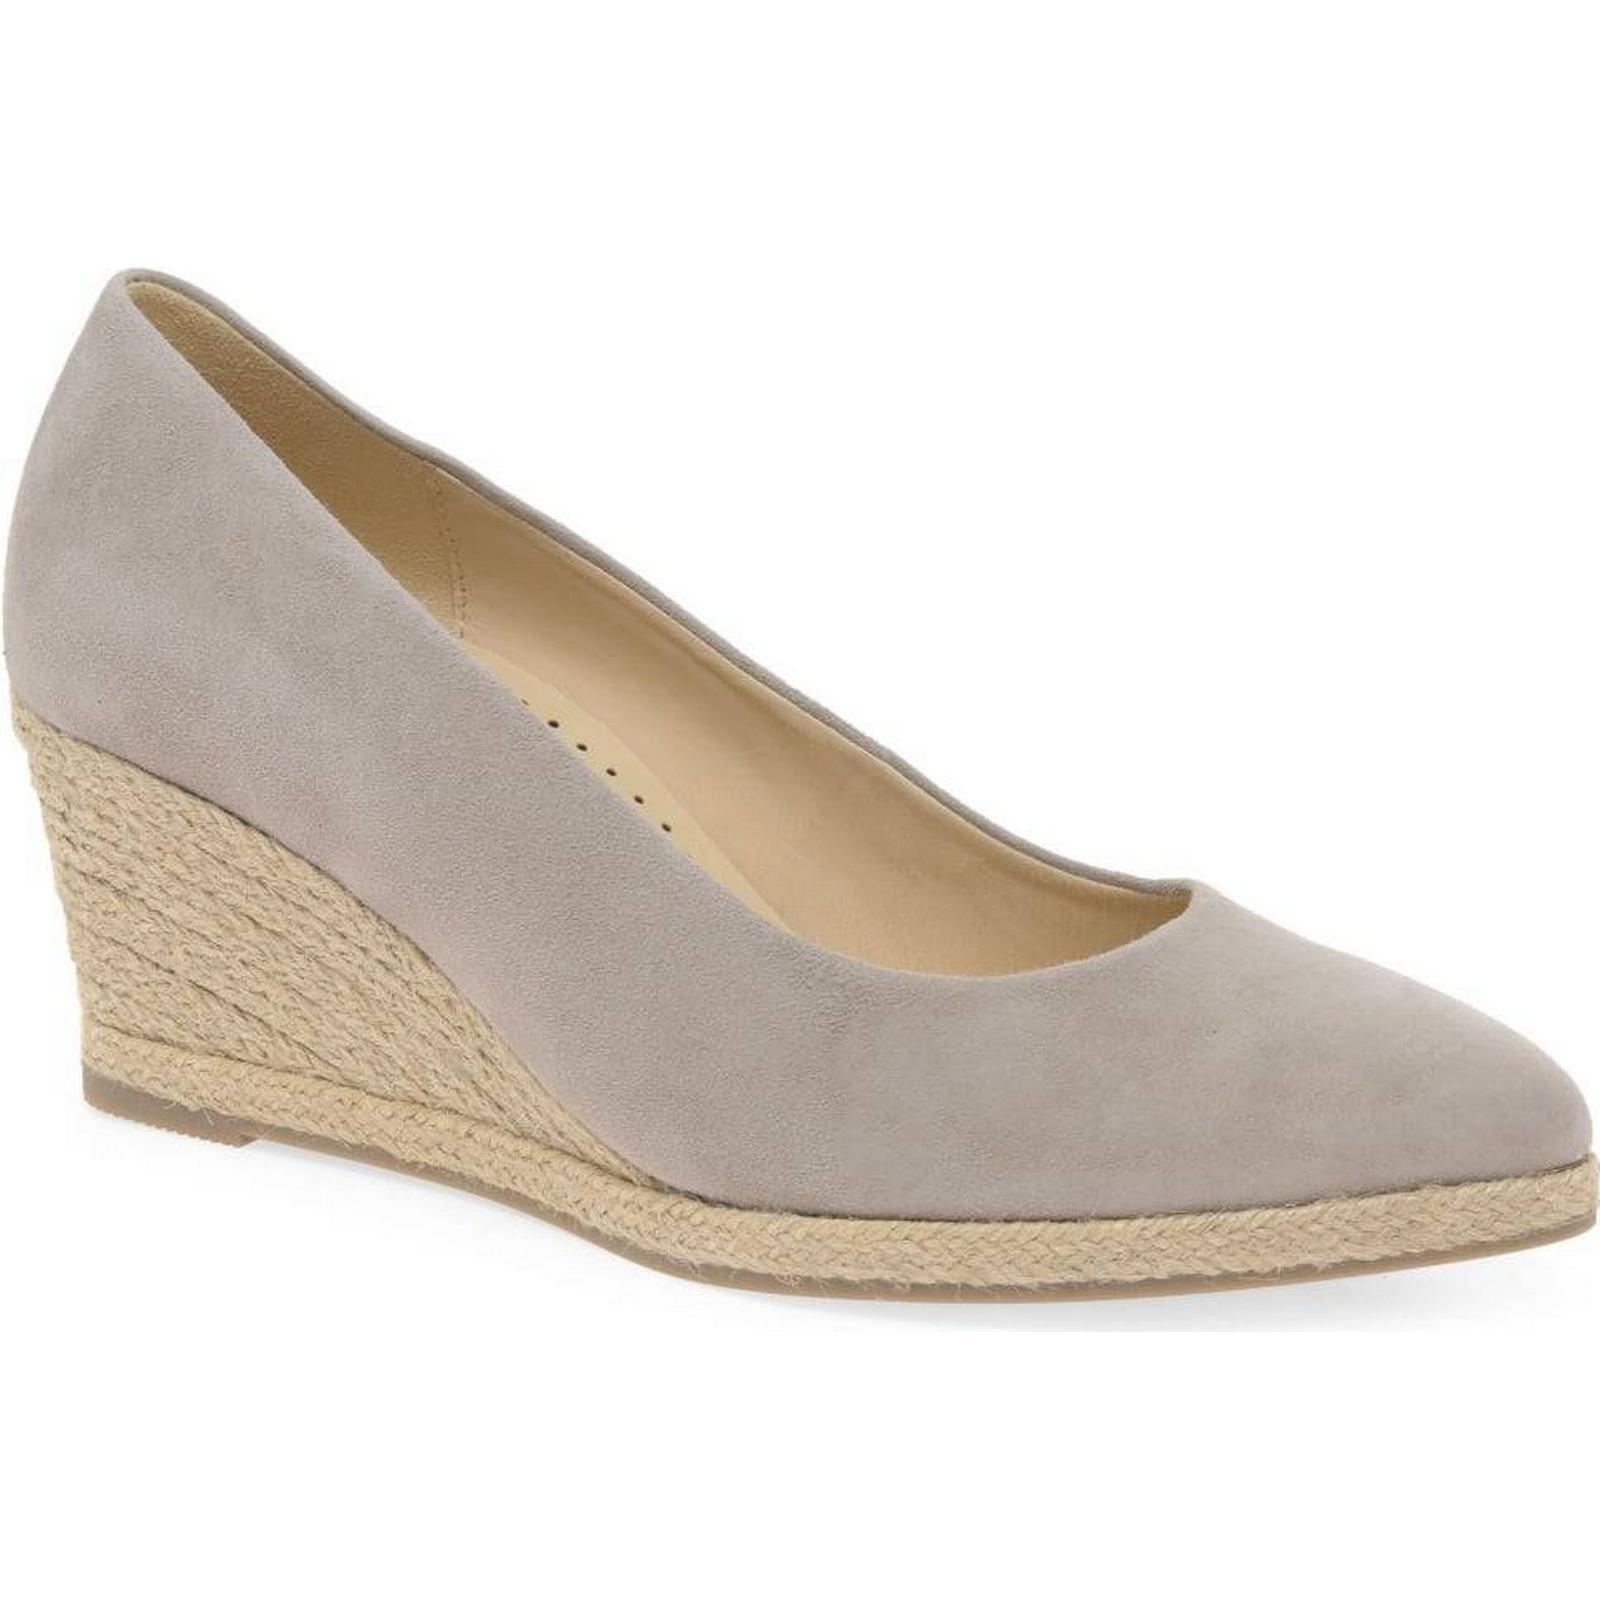 Gabor Paisley Shoes Womens Wedge Heel Court Shoes Paisley Colour: Beige Suede, Size: 4c2186